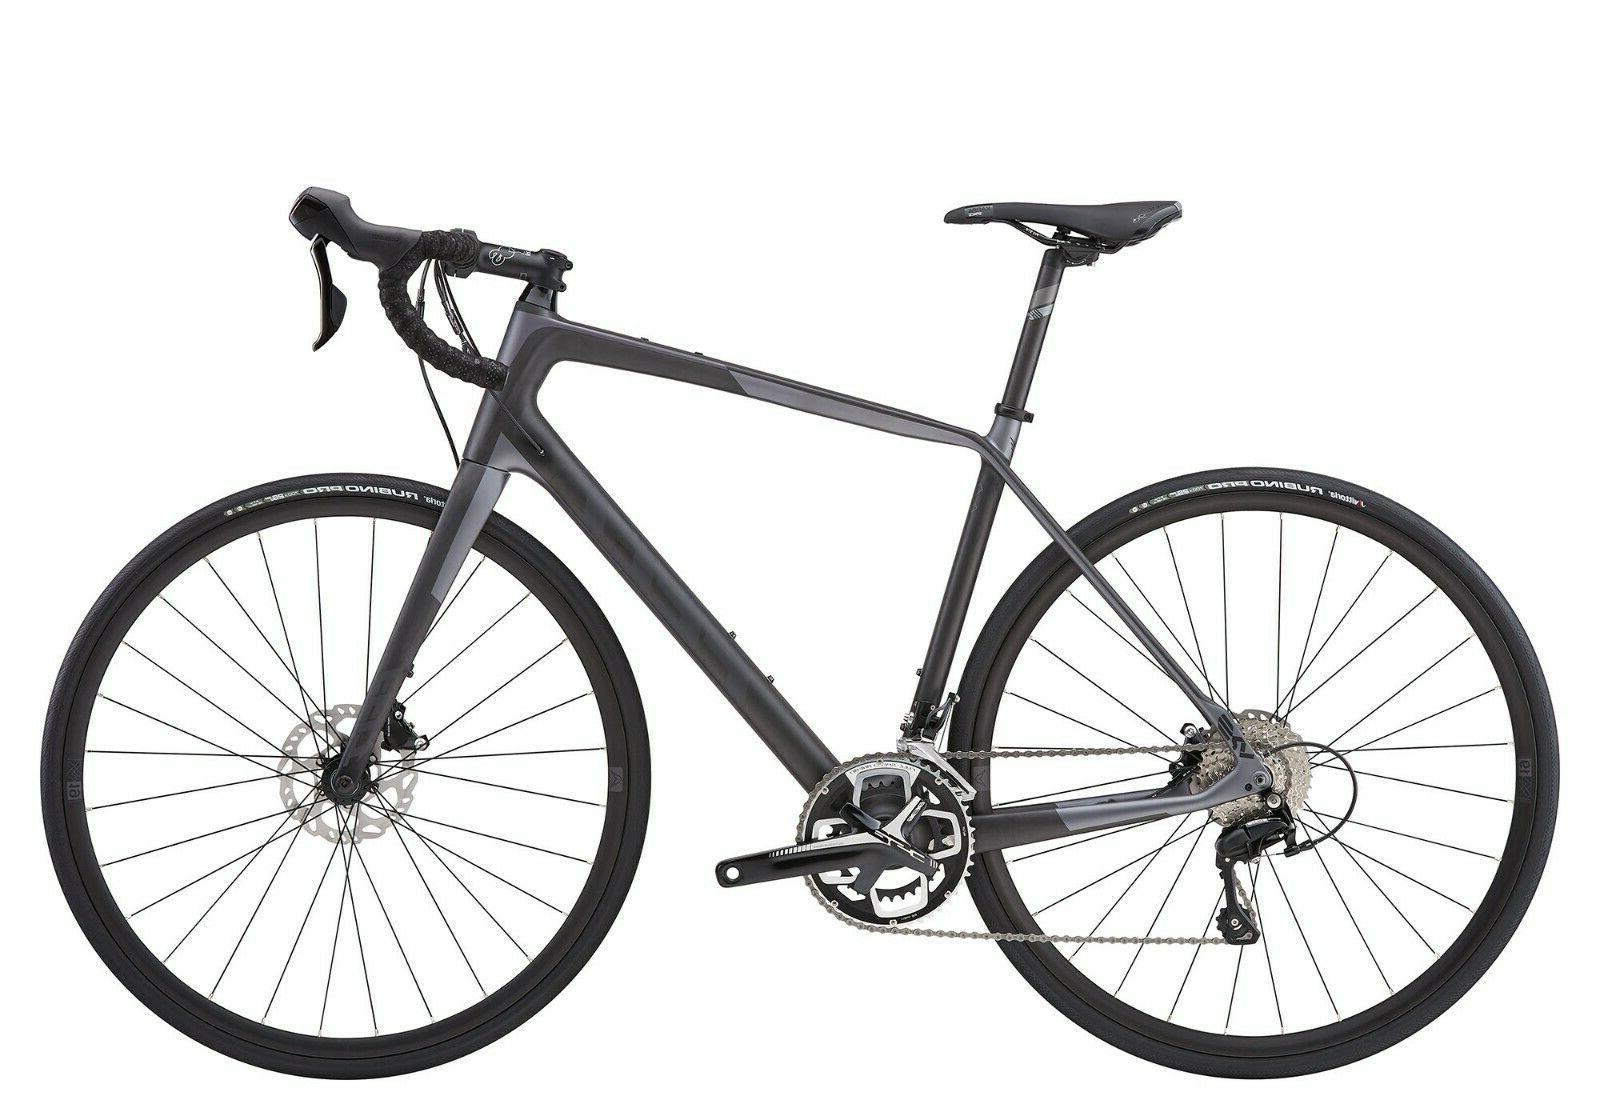 2018 Felt Fiber DISC Bike 51cm